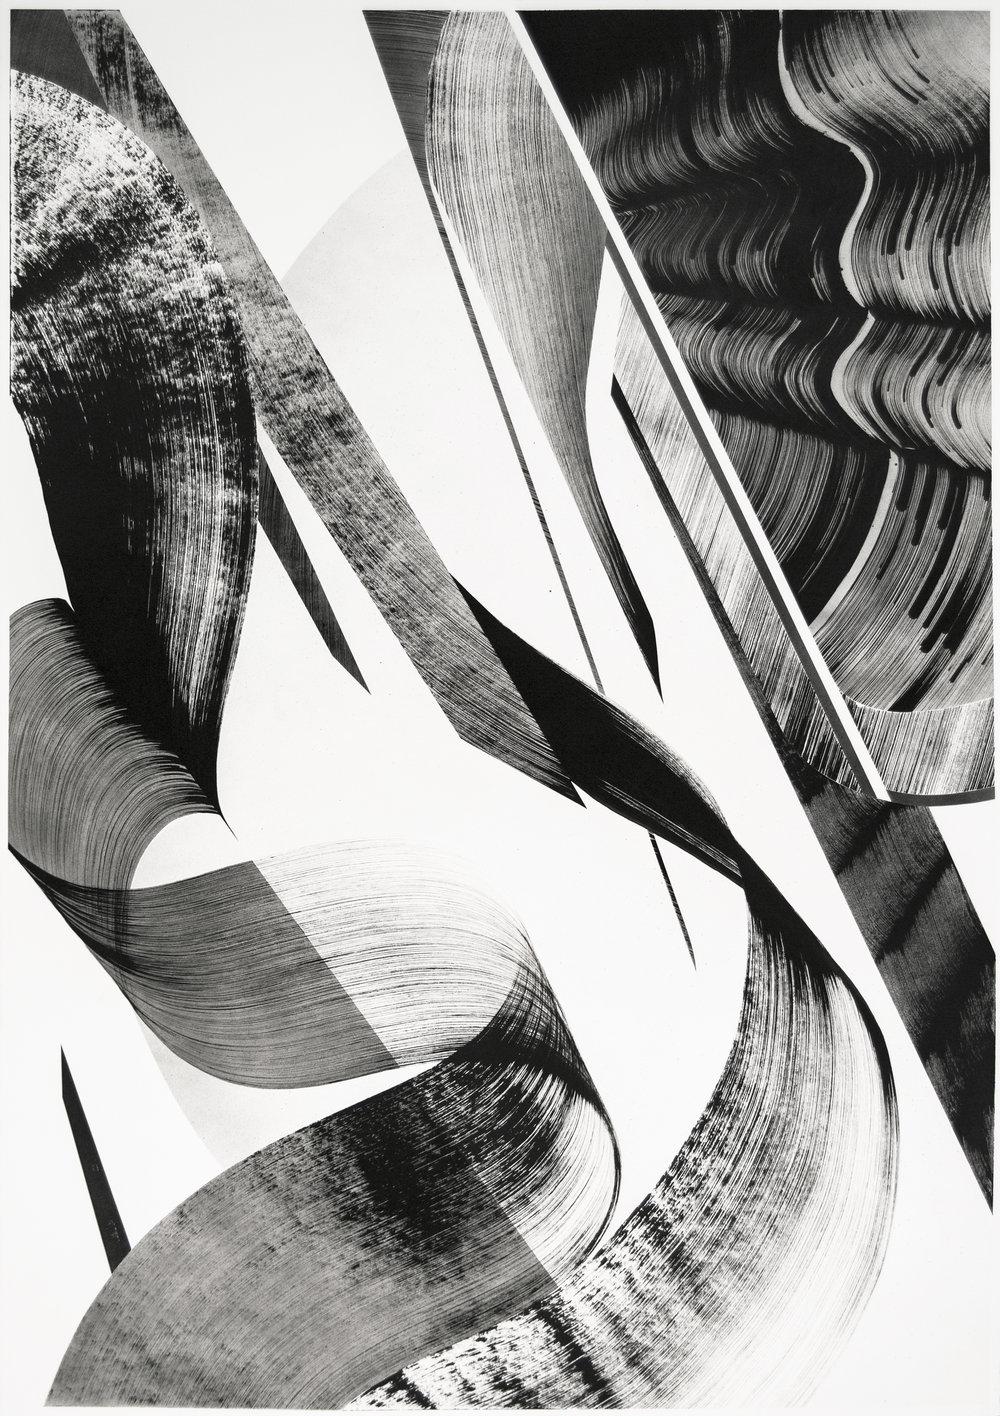 "44"" x 30""  Acrylic, Ink, & Aerosol on Paper  2015"